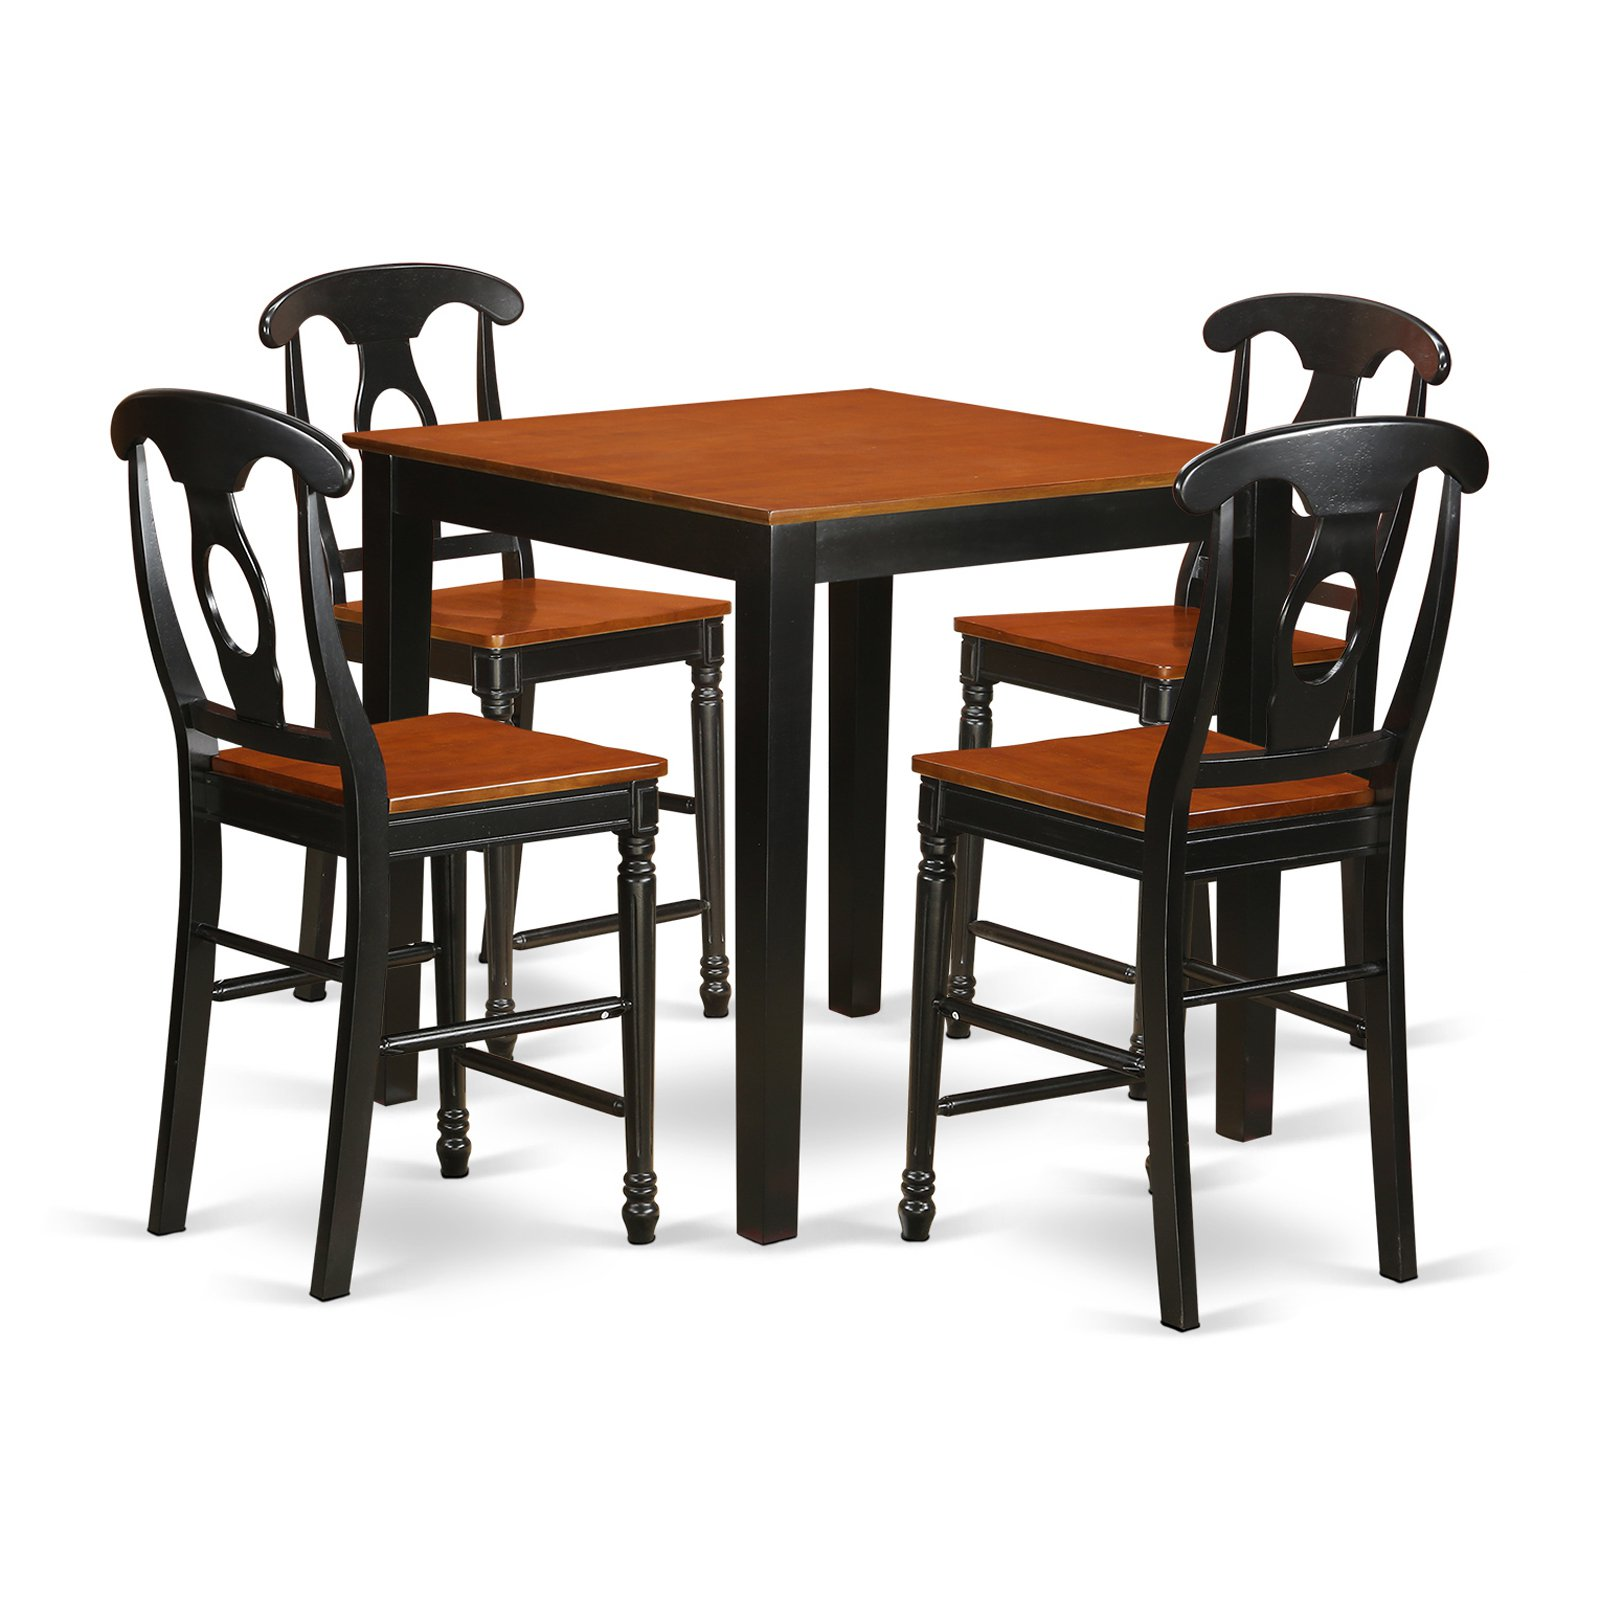 East West Furniture Pub 5 Piece Keyhole Dining Table Set